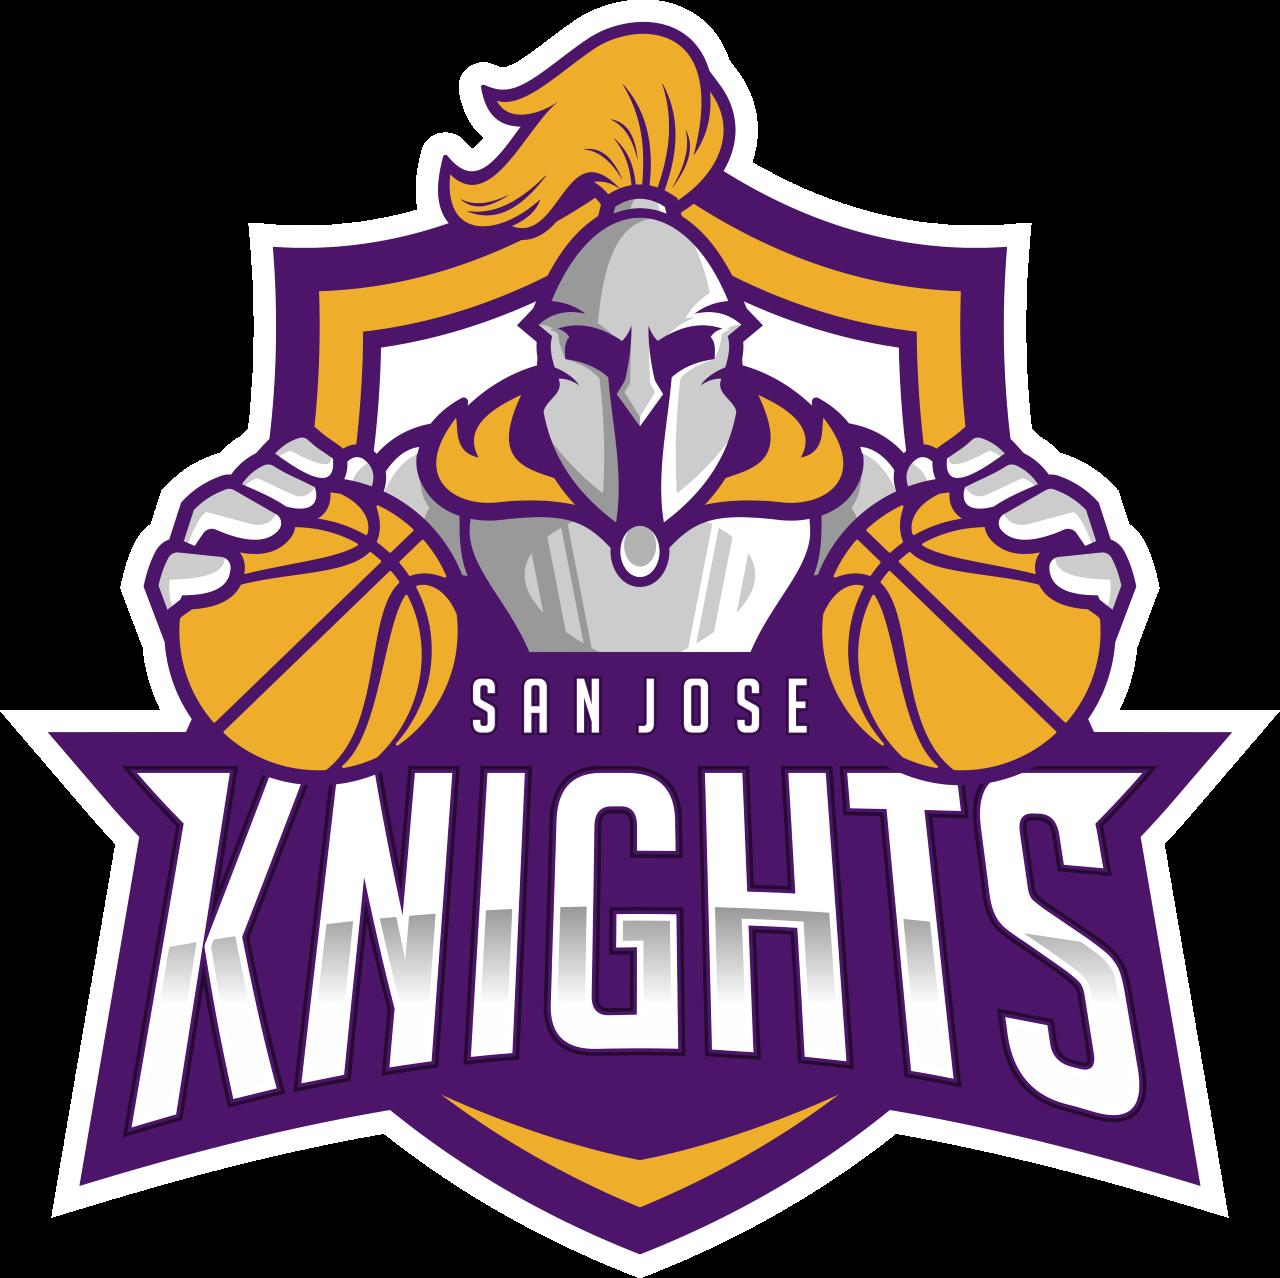 San Jose Knights